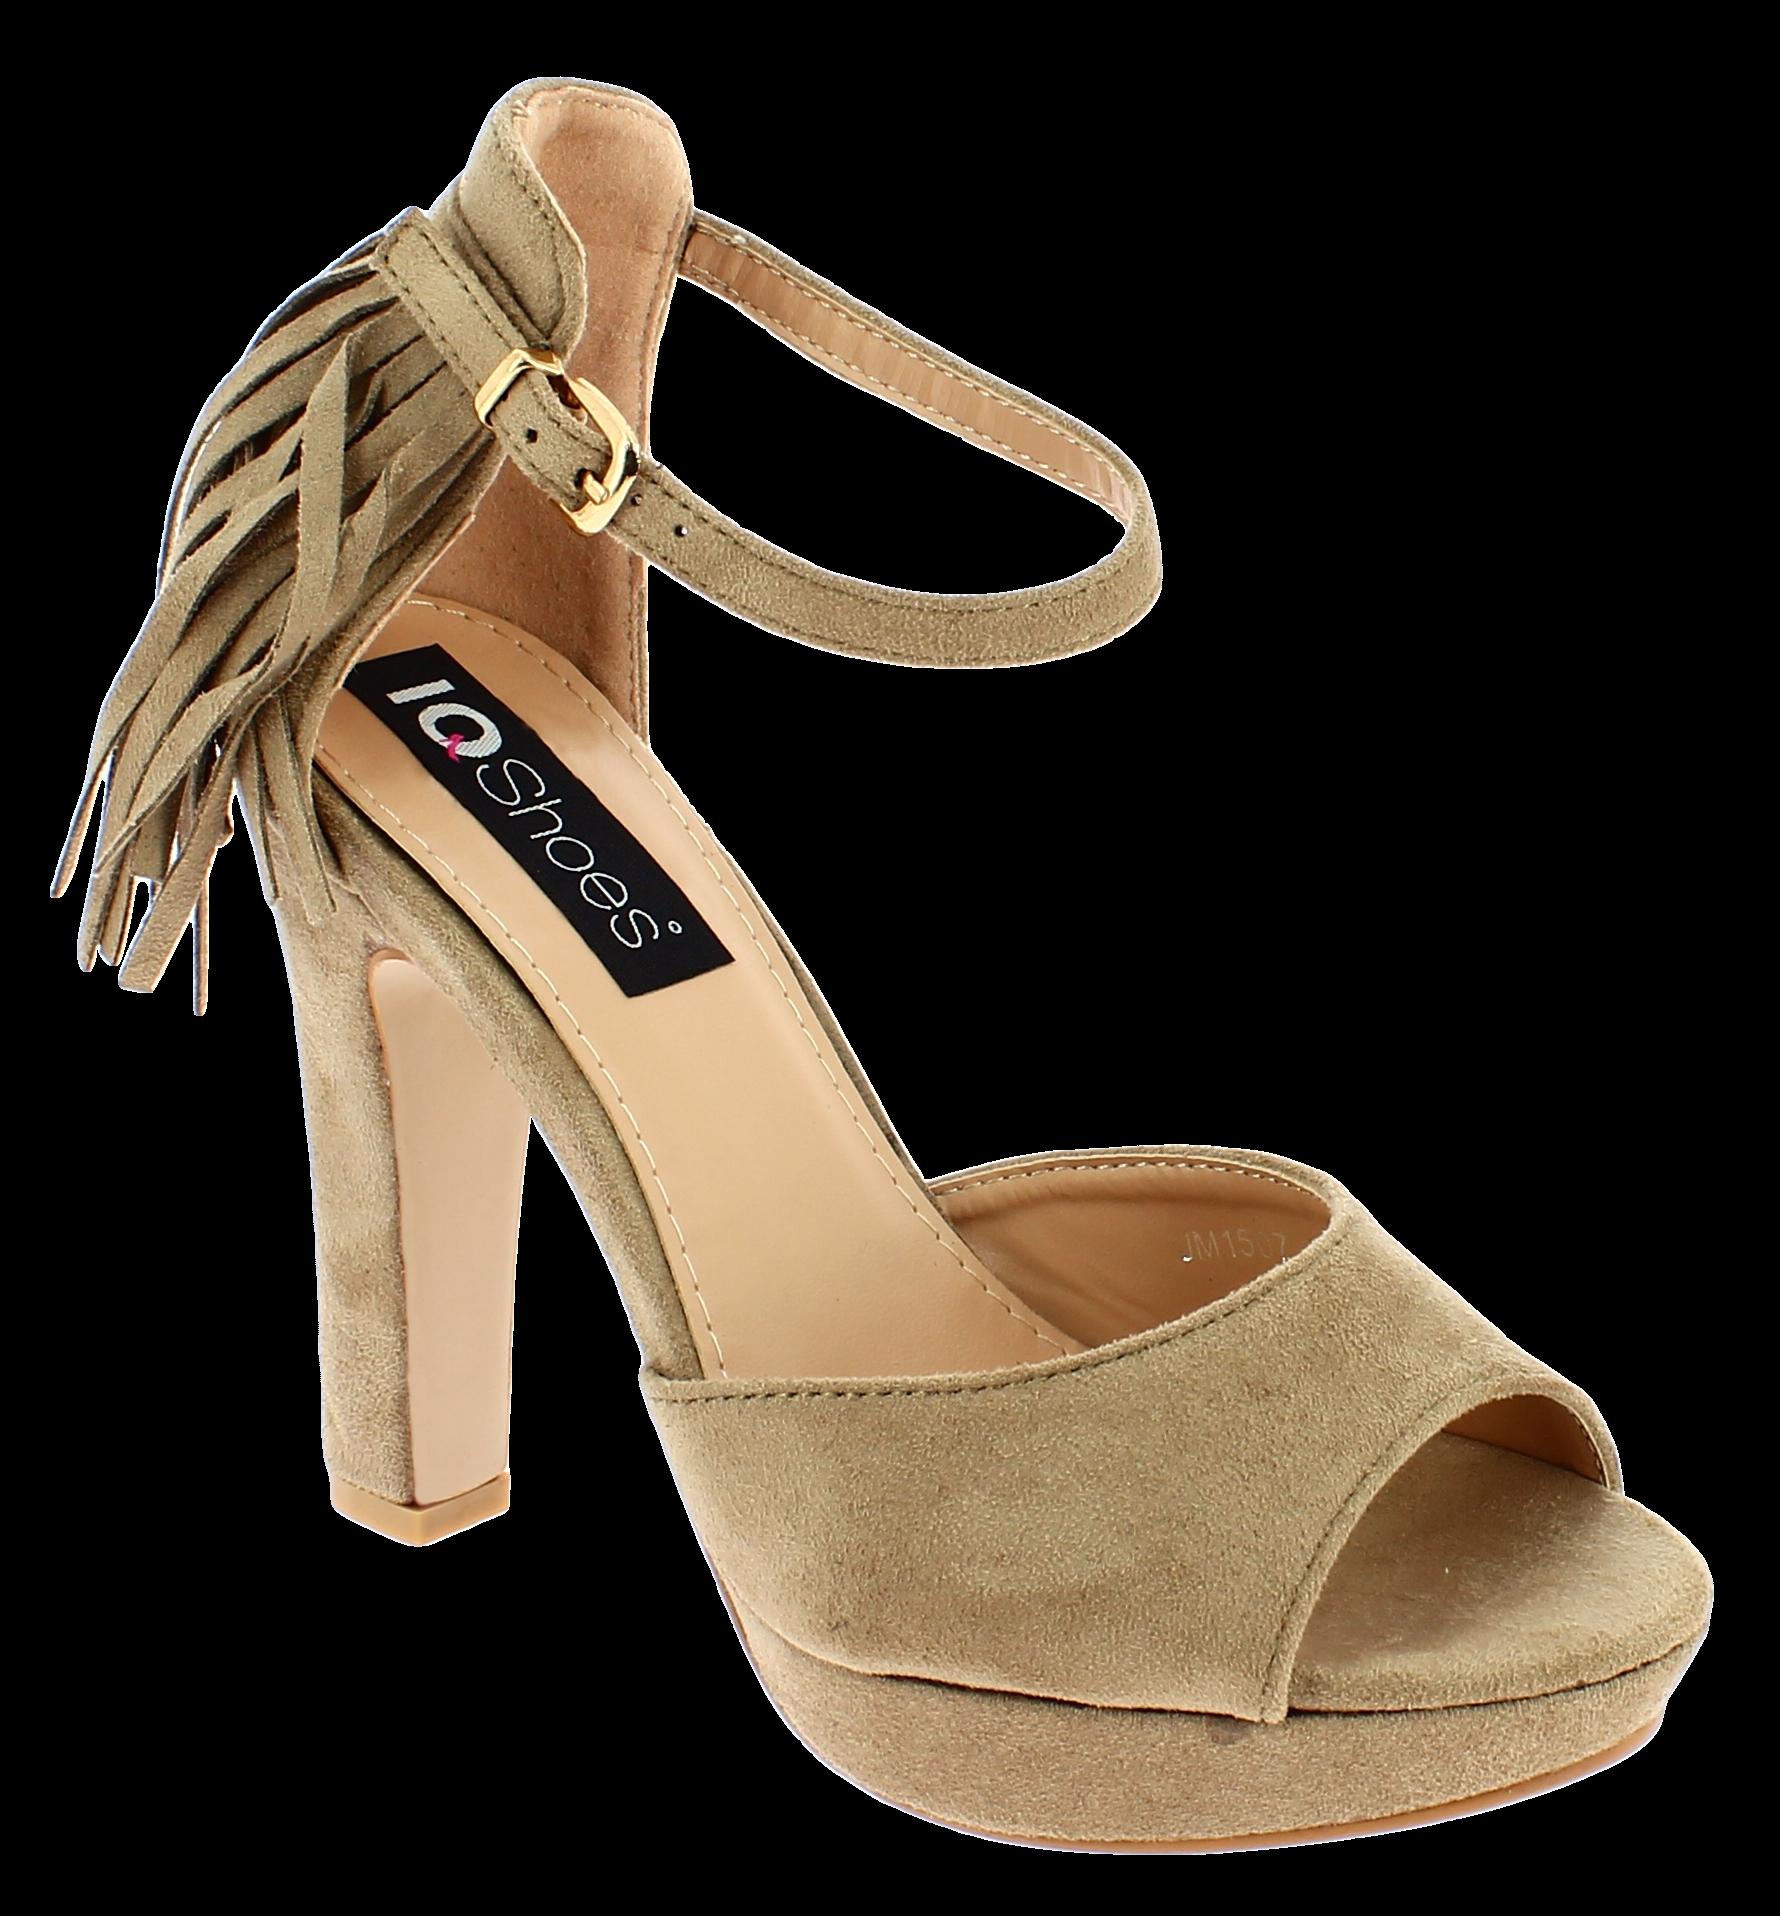 IQSHOES Γυναικείο Πέδιλο JM1507 Μπεζ - IqShoes - JM1507 BEIGE-IQSHOES-beige-37/1 παπούτσια  γυναικεία σανδάλια   πέδιλα